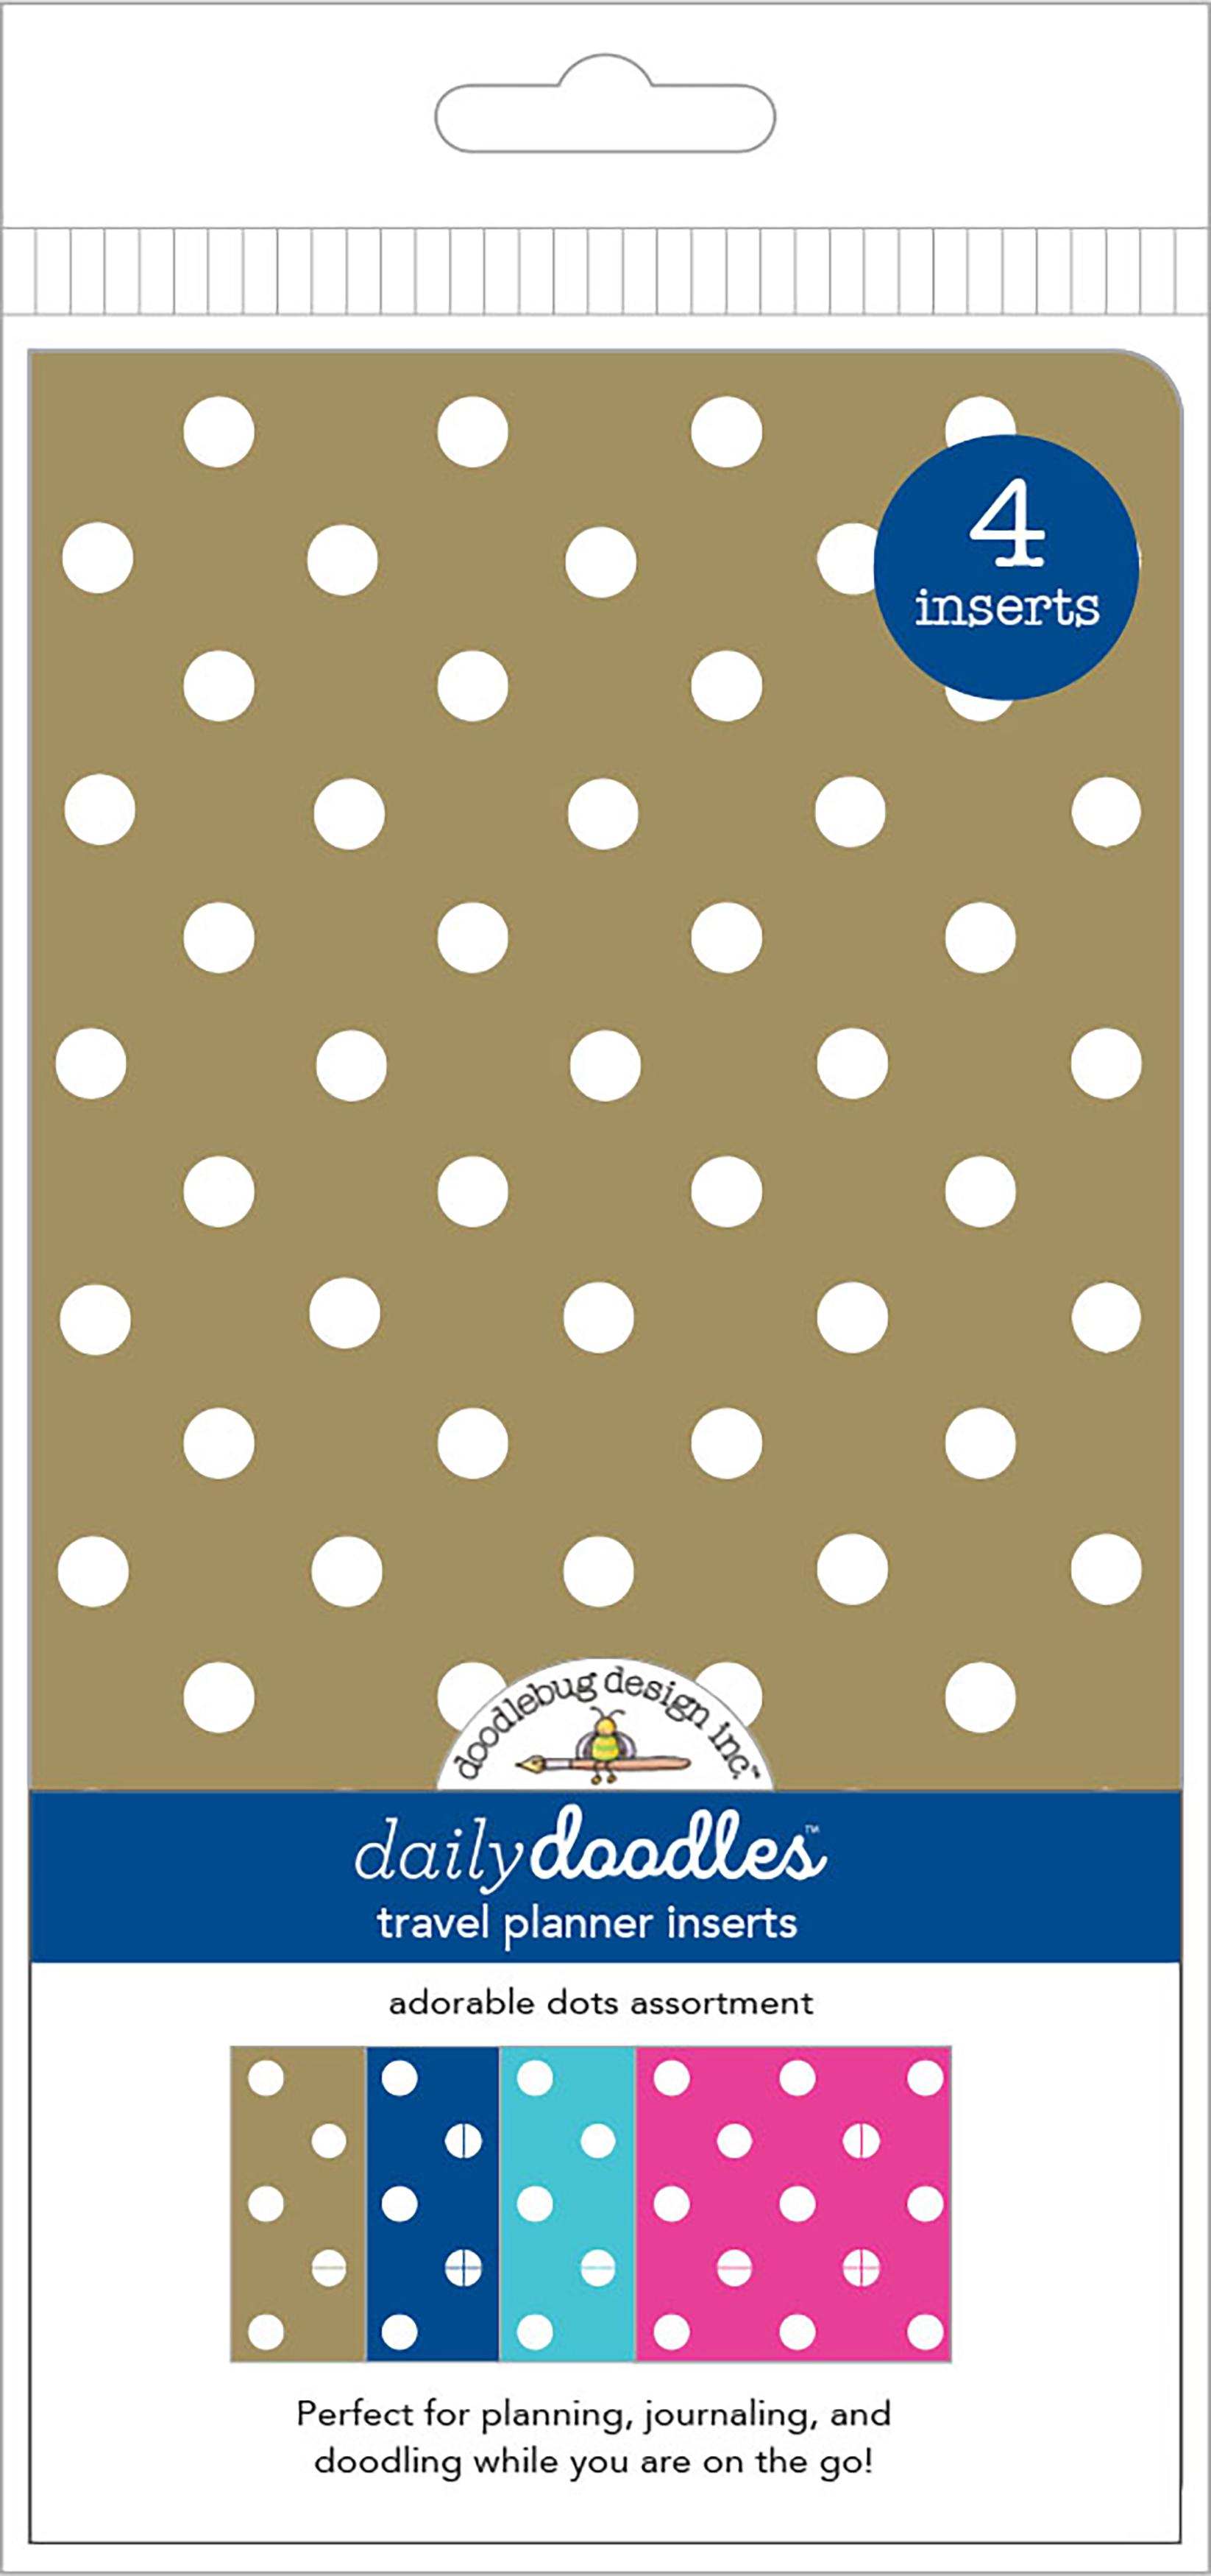 Doodlebug Daily Doodles - Adorable Dots Travel Planner Inserts, 4/Pack